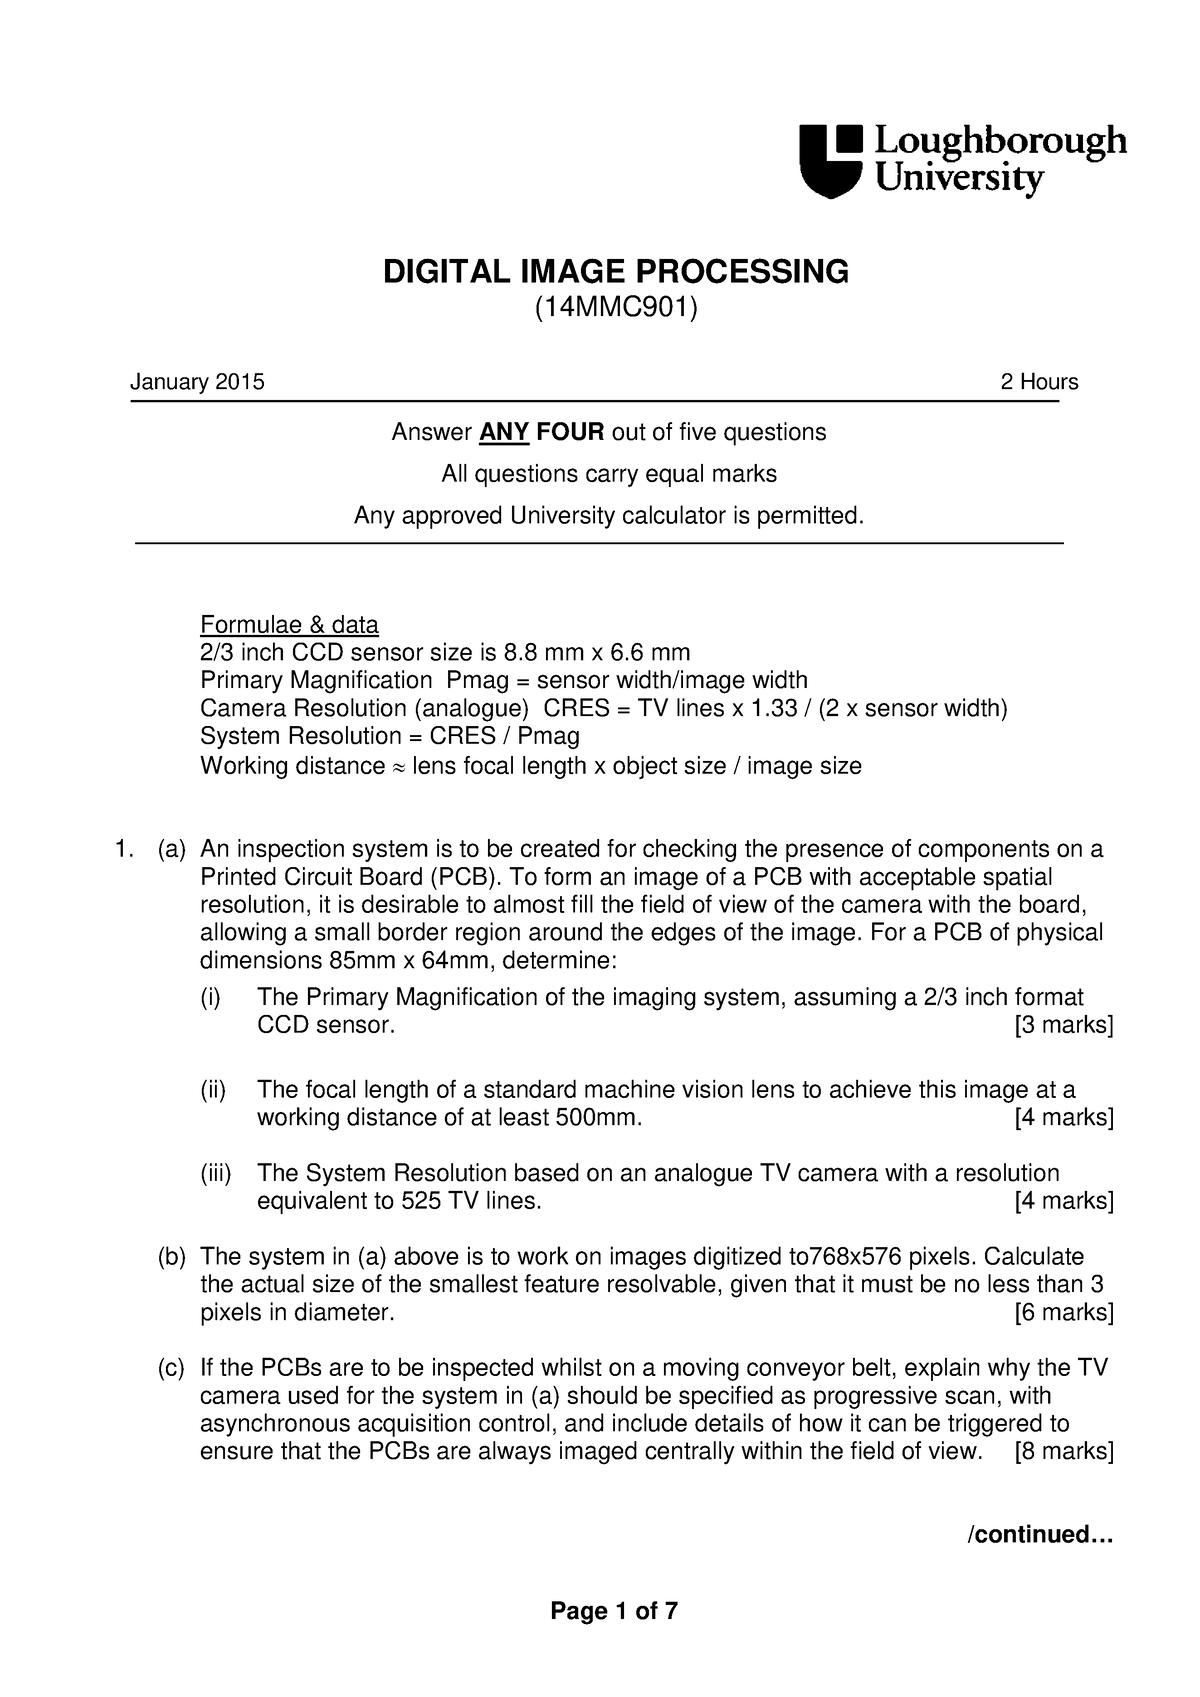 Examen 2015 - 17MMC901: Digital Image Processing - StuDocu